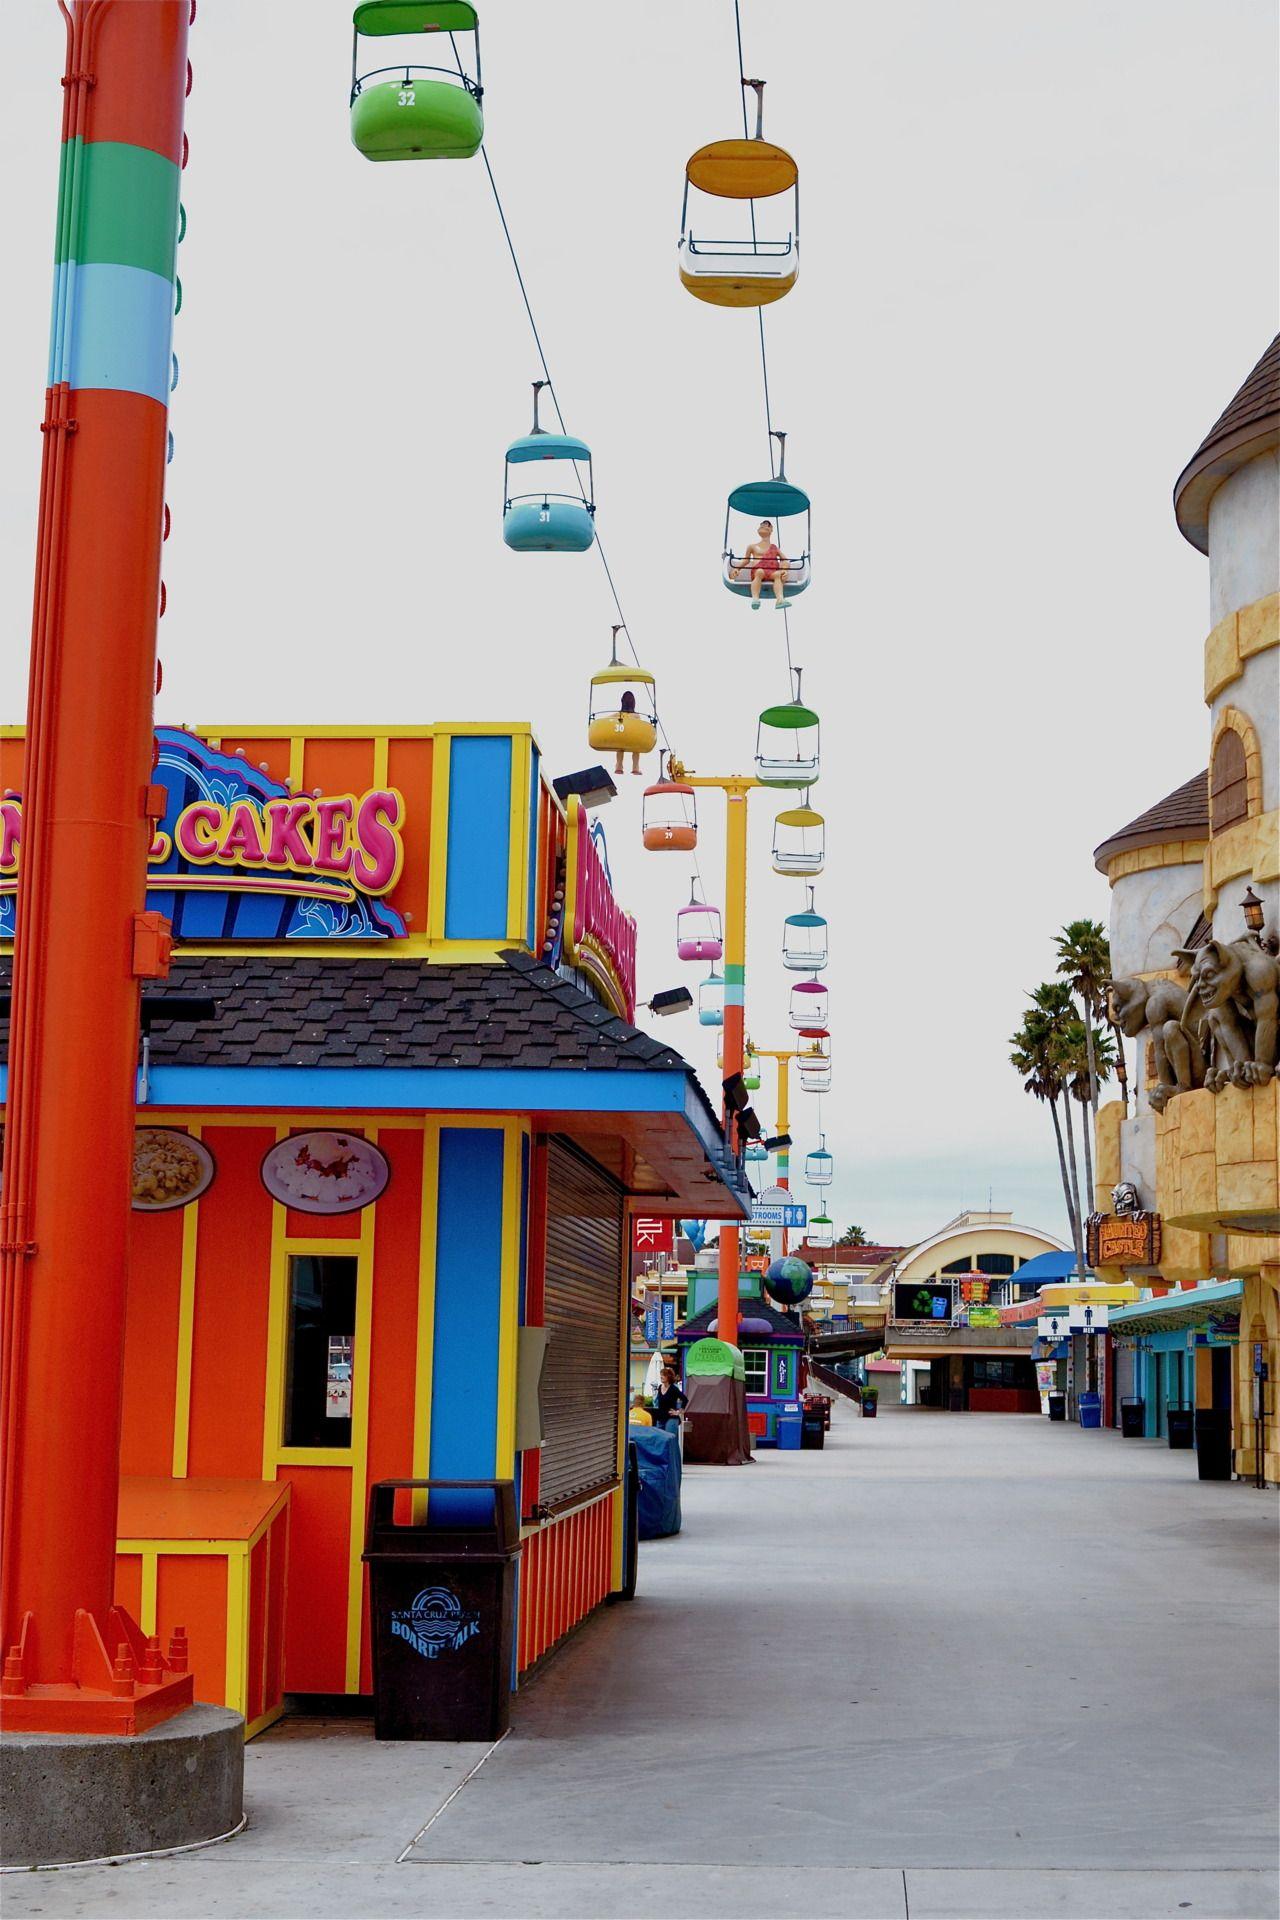 Santa Cruz Boardwalk. California / USA | California travel ...